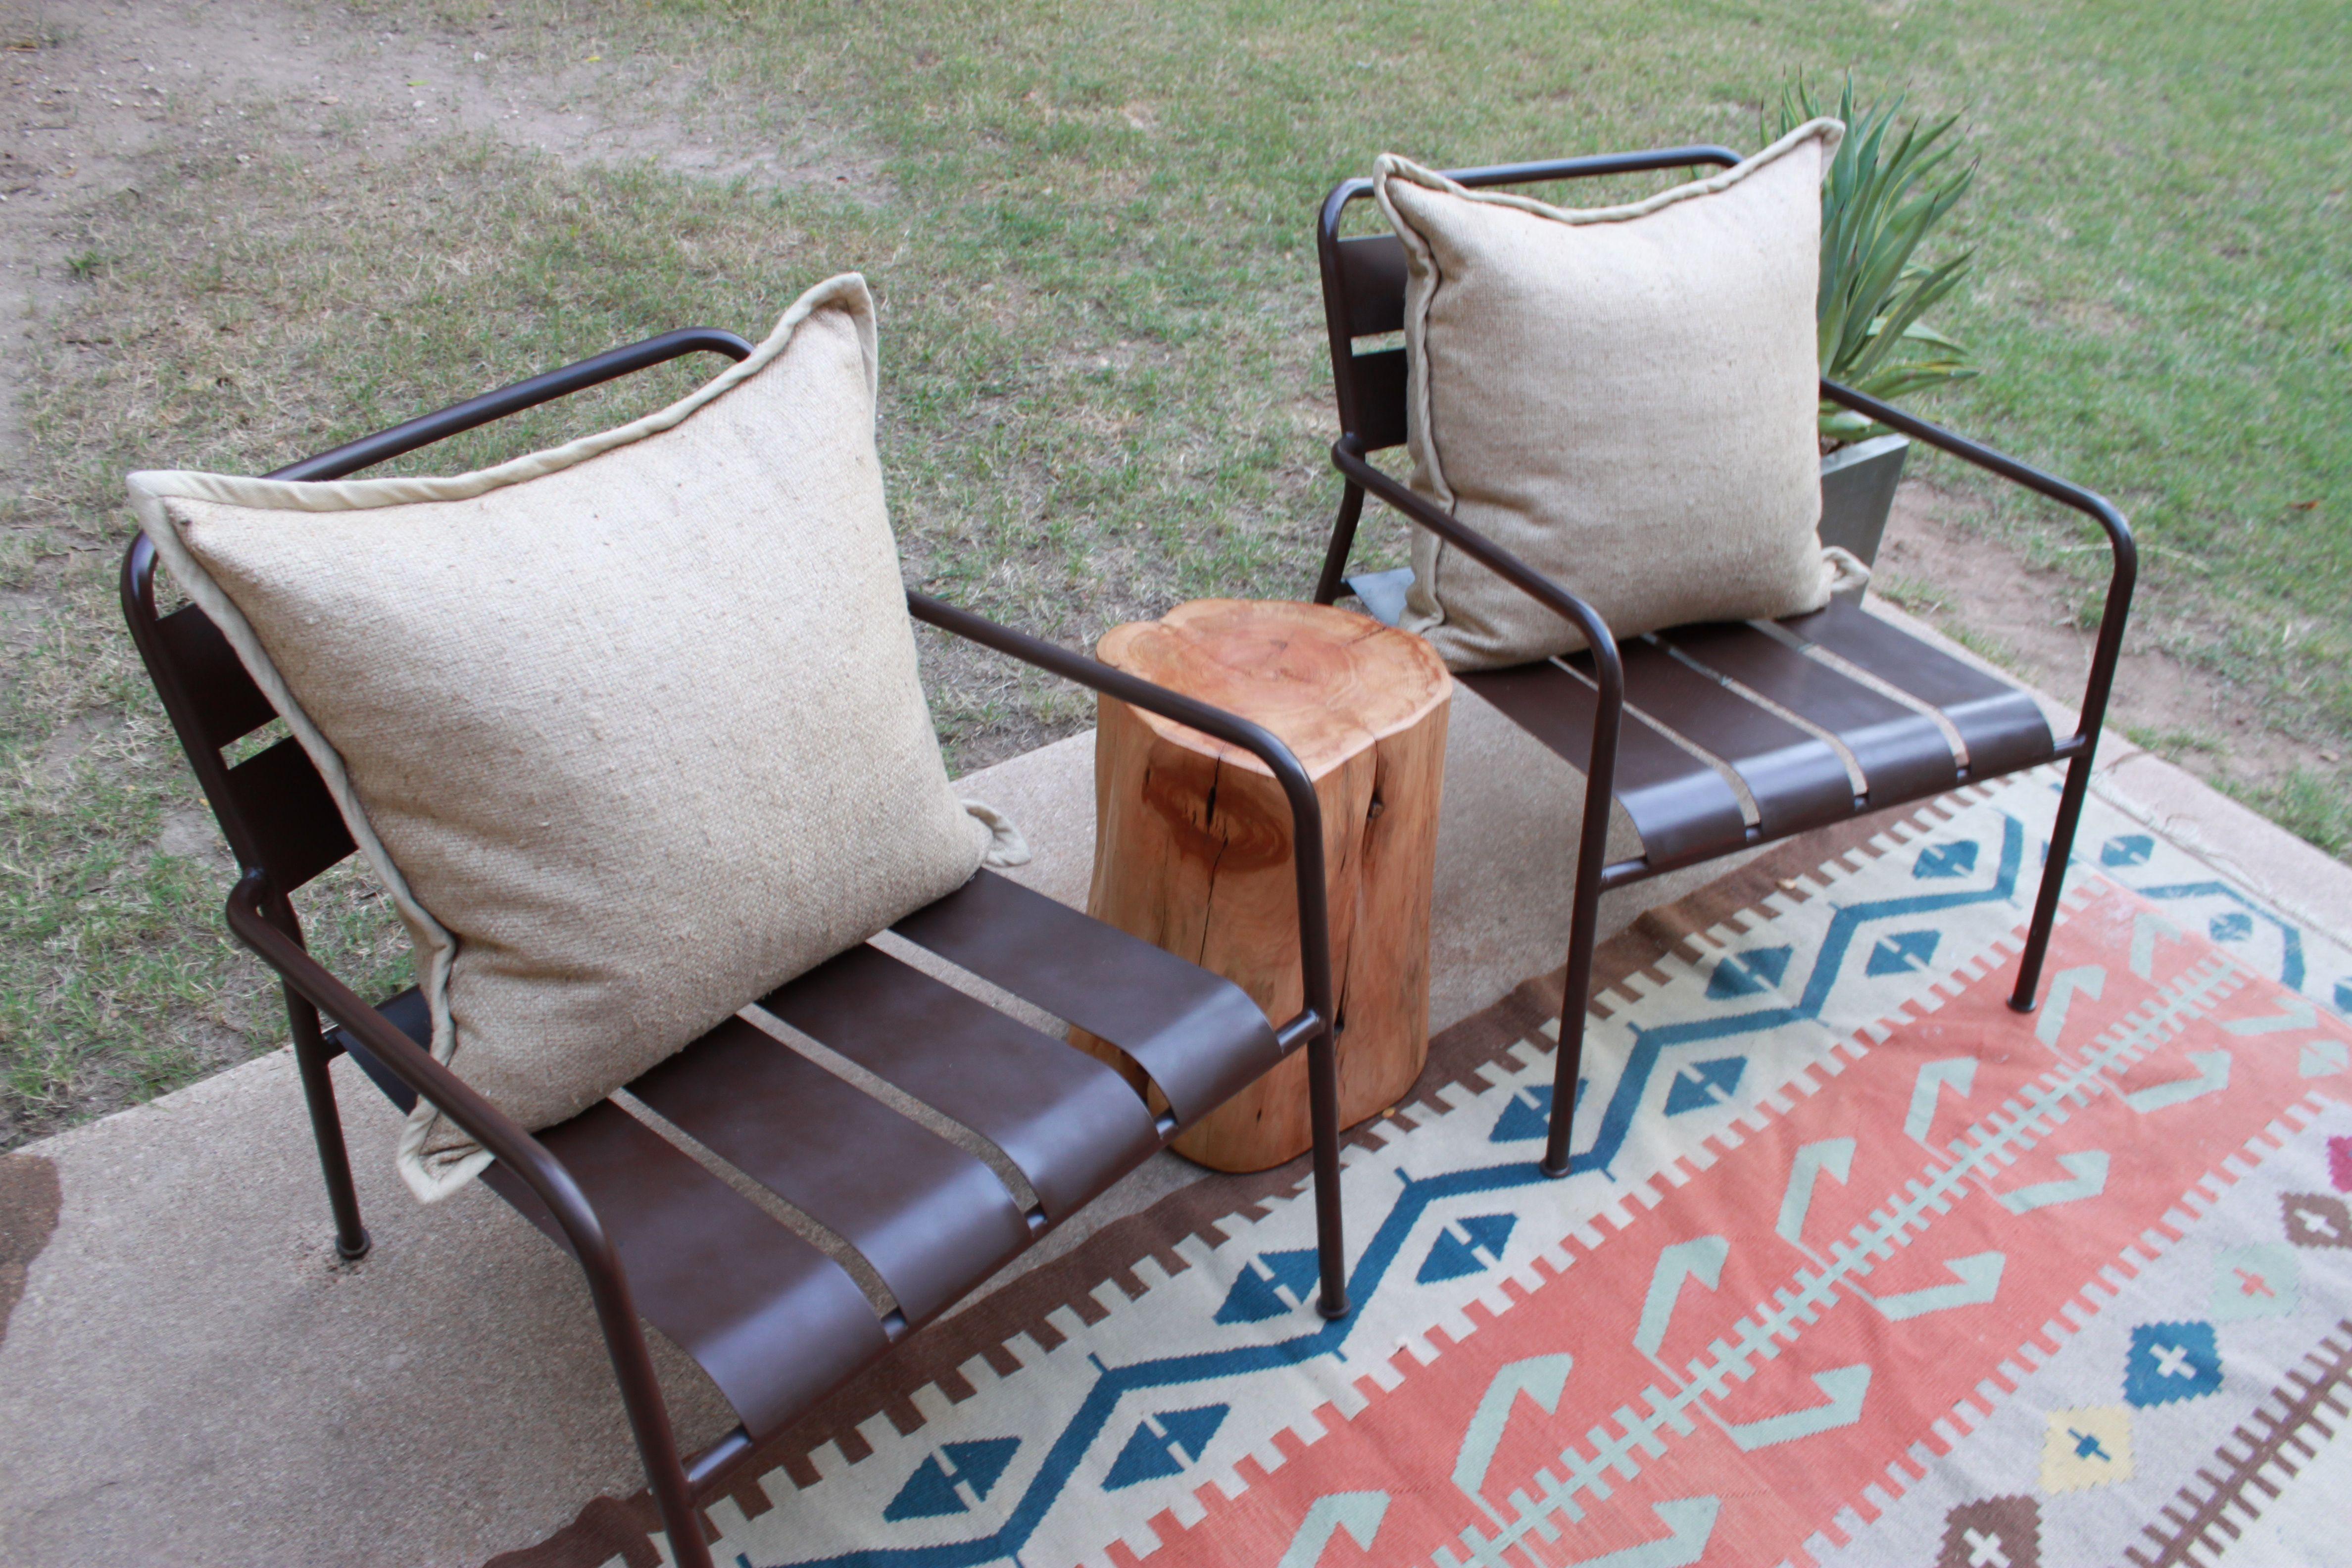 Metal Ikea Chairs Painted Brown